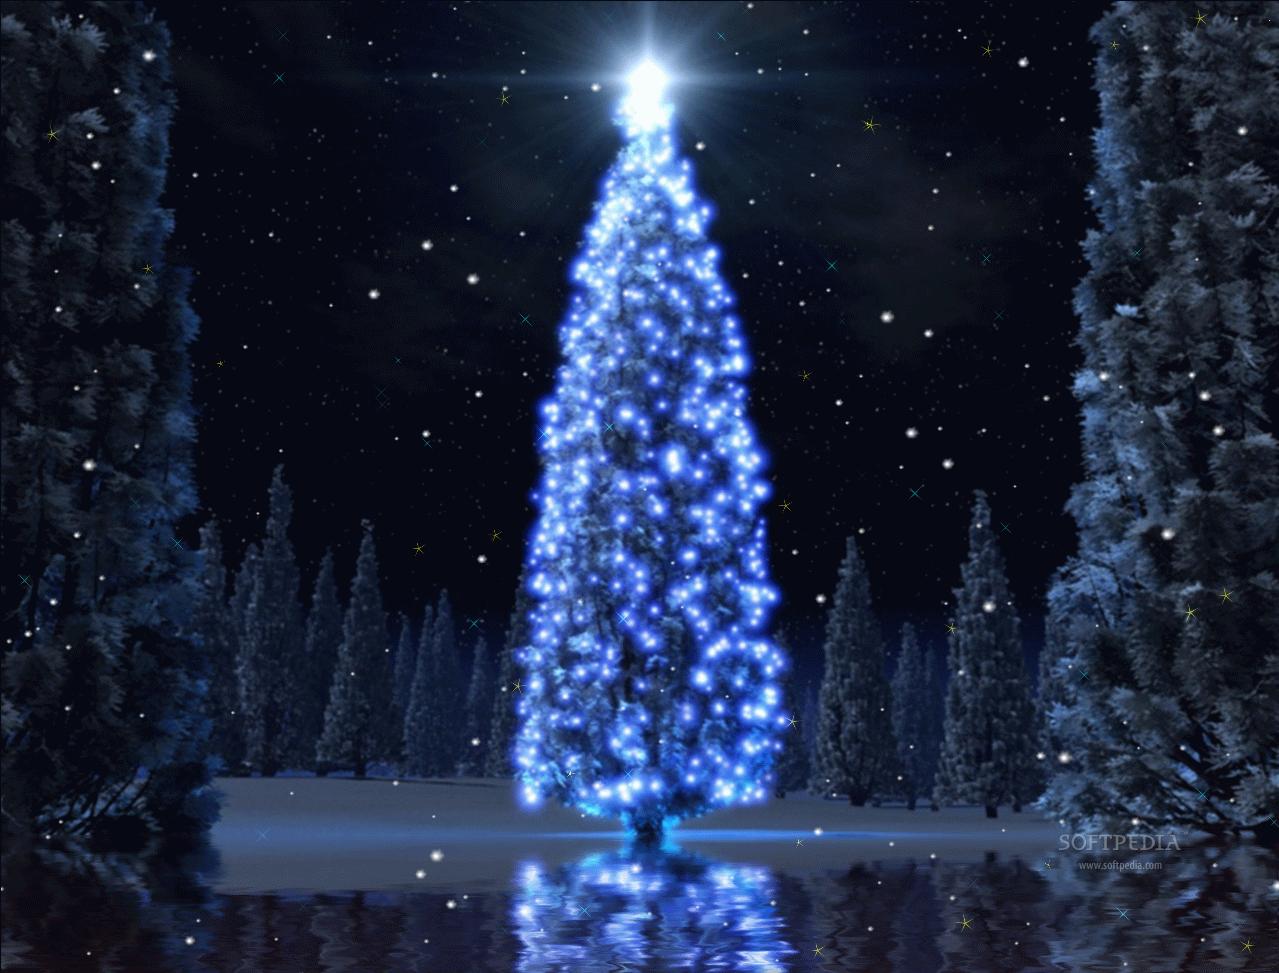 3d christmas desktop wallpaper3d christmas desktop wallpaper animated 1279x973